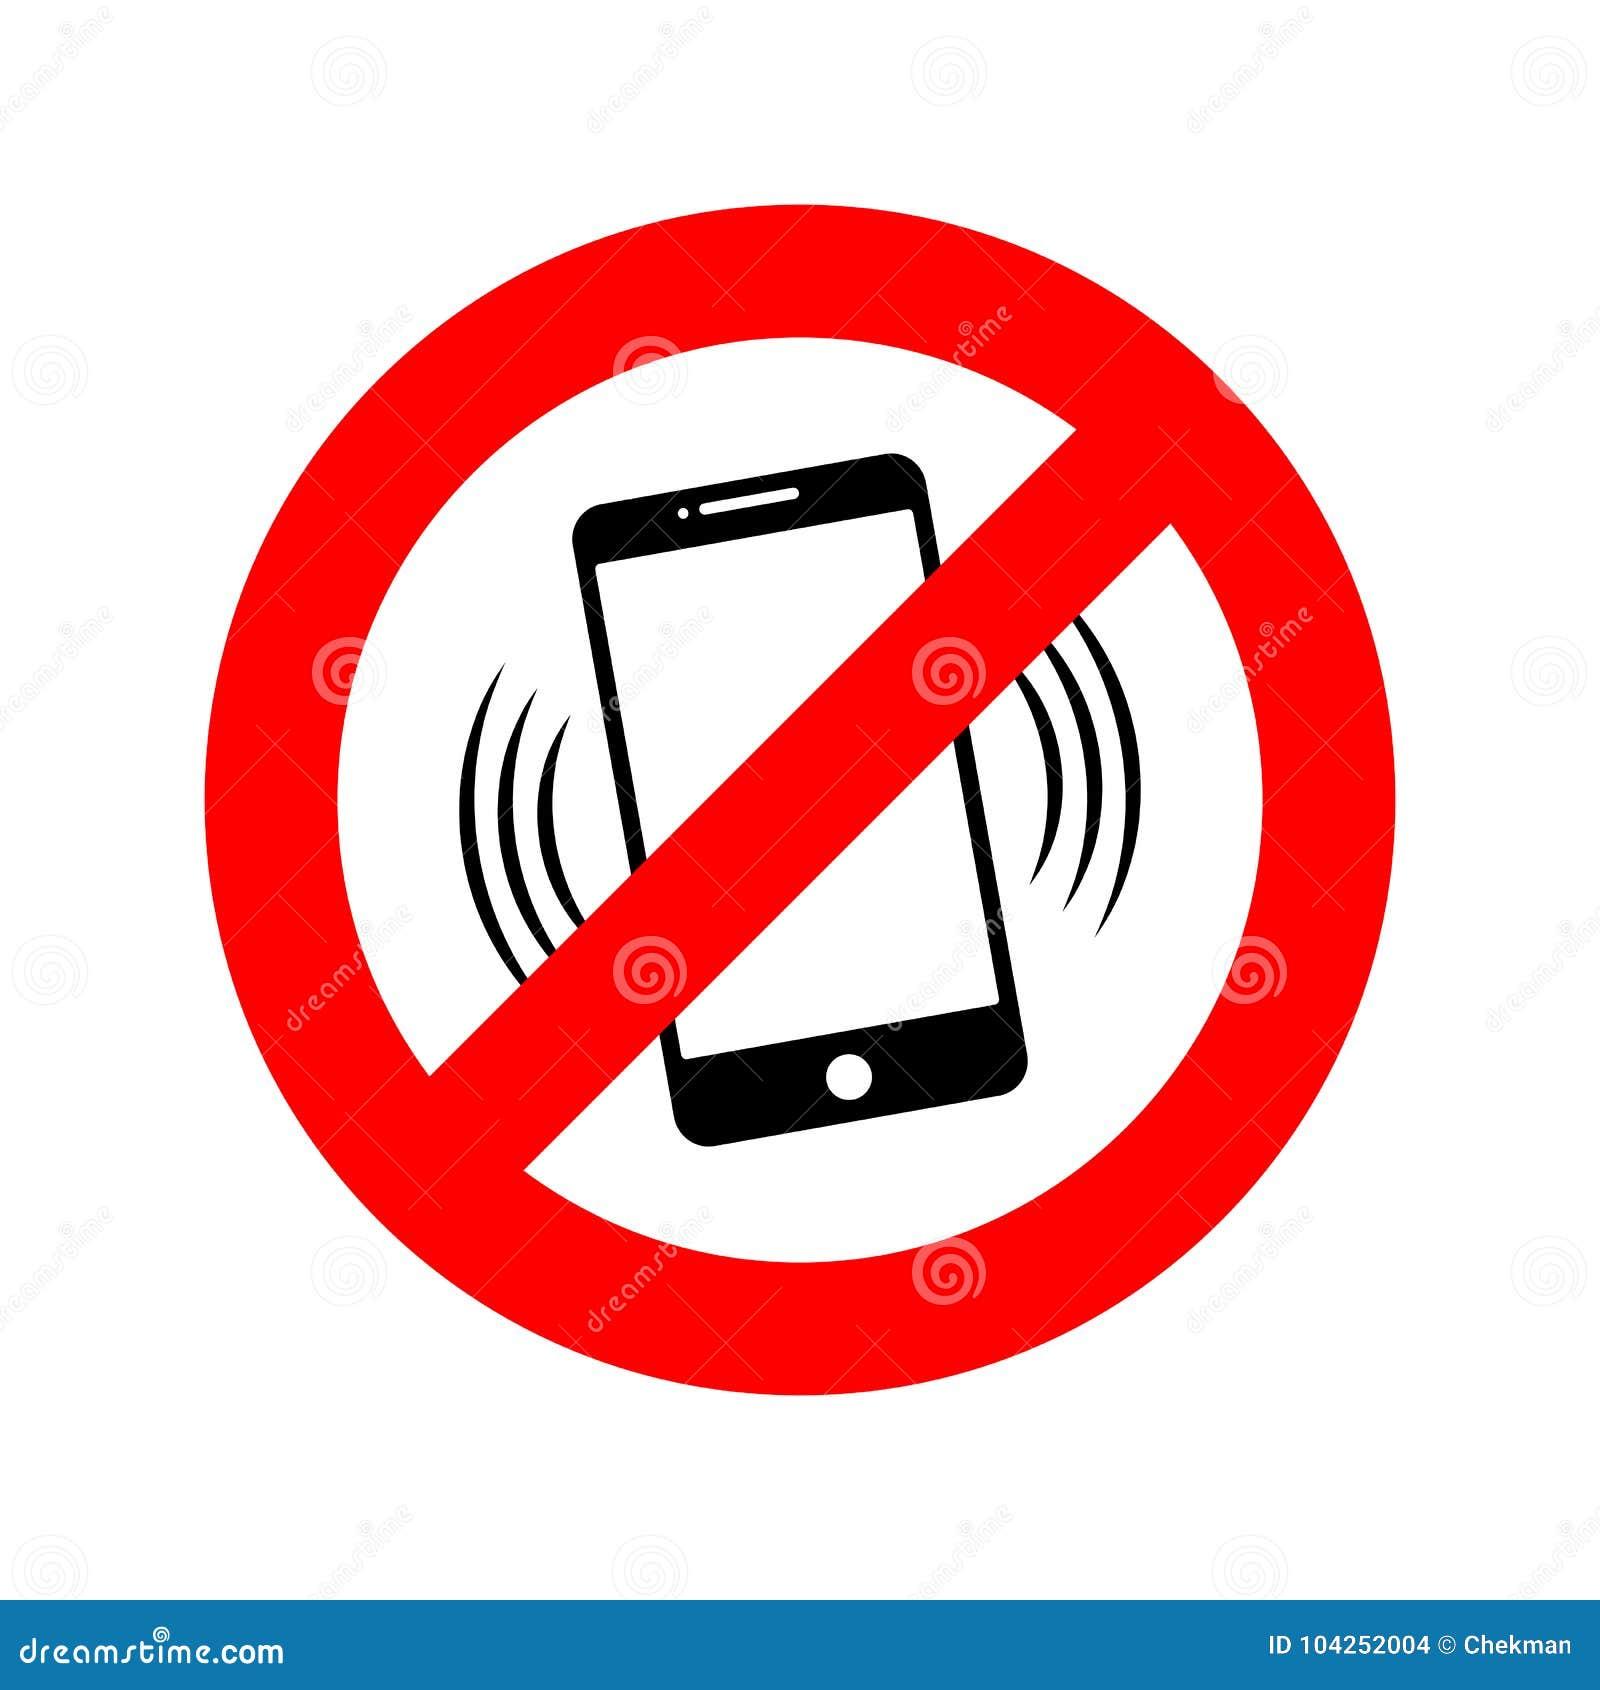 download no phone sign vector illustration stock illustration illustration of round button